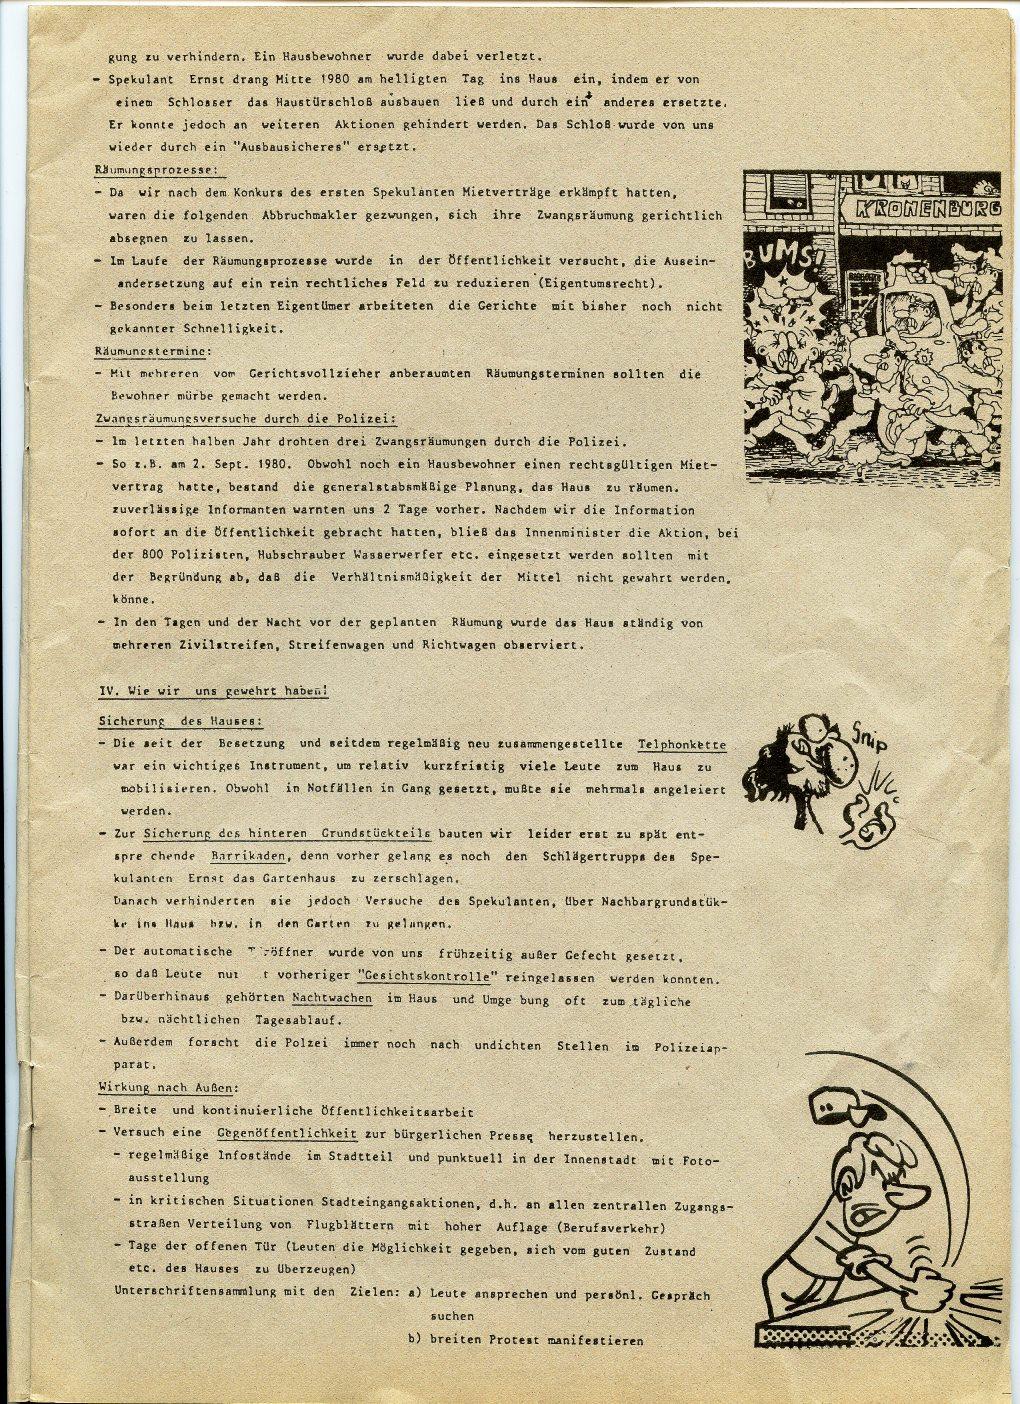 Muenster_Info_1981_1_20